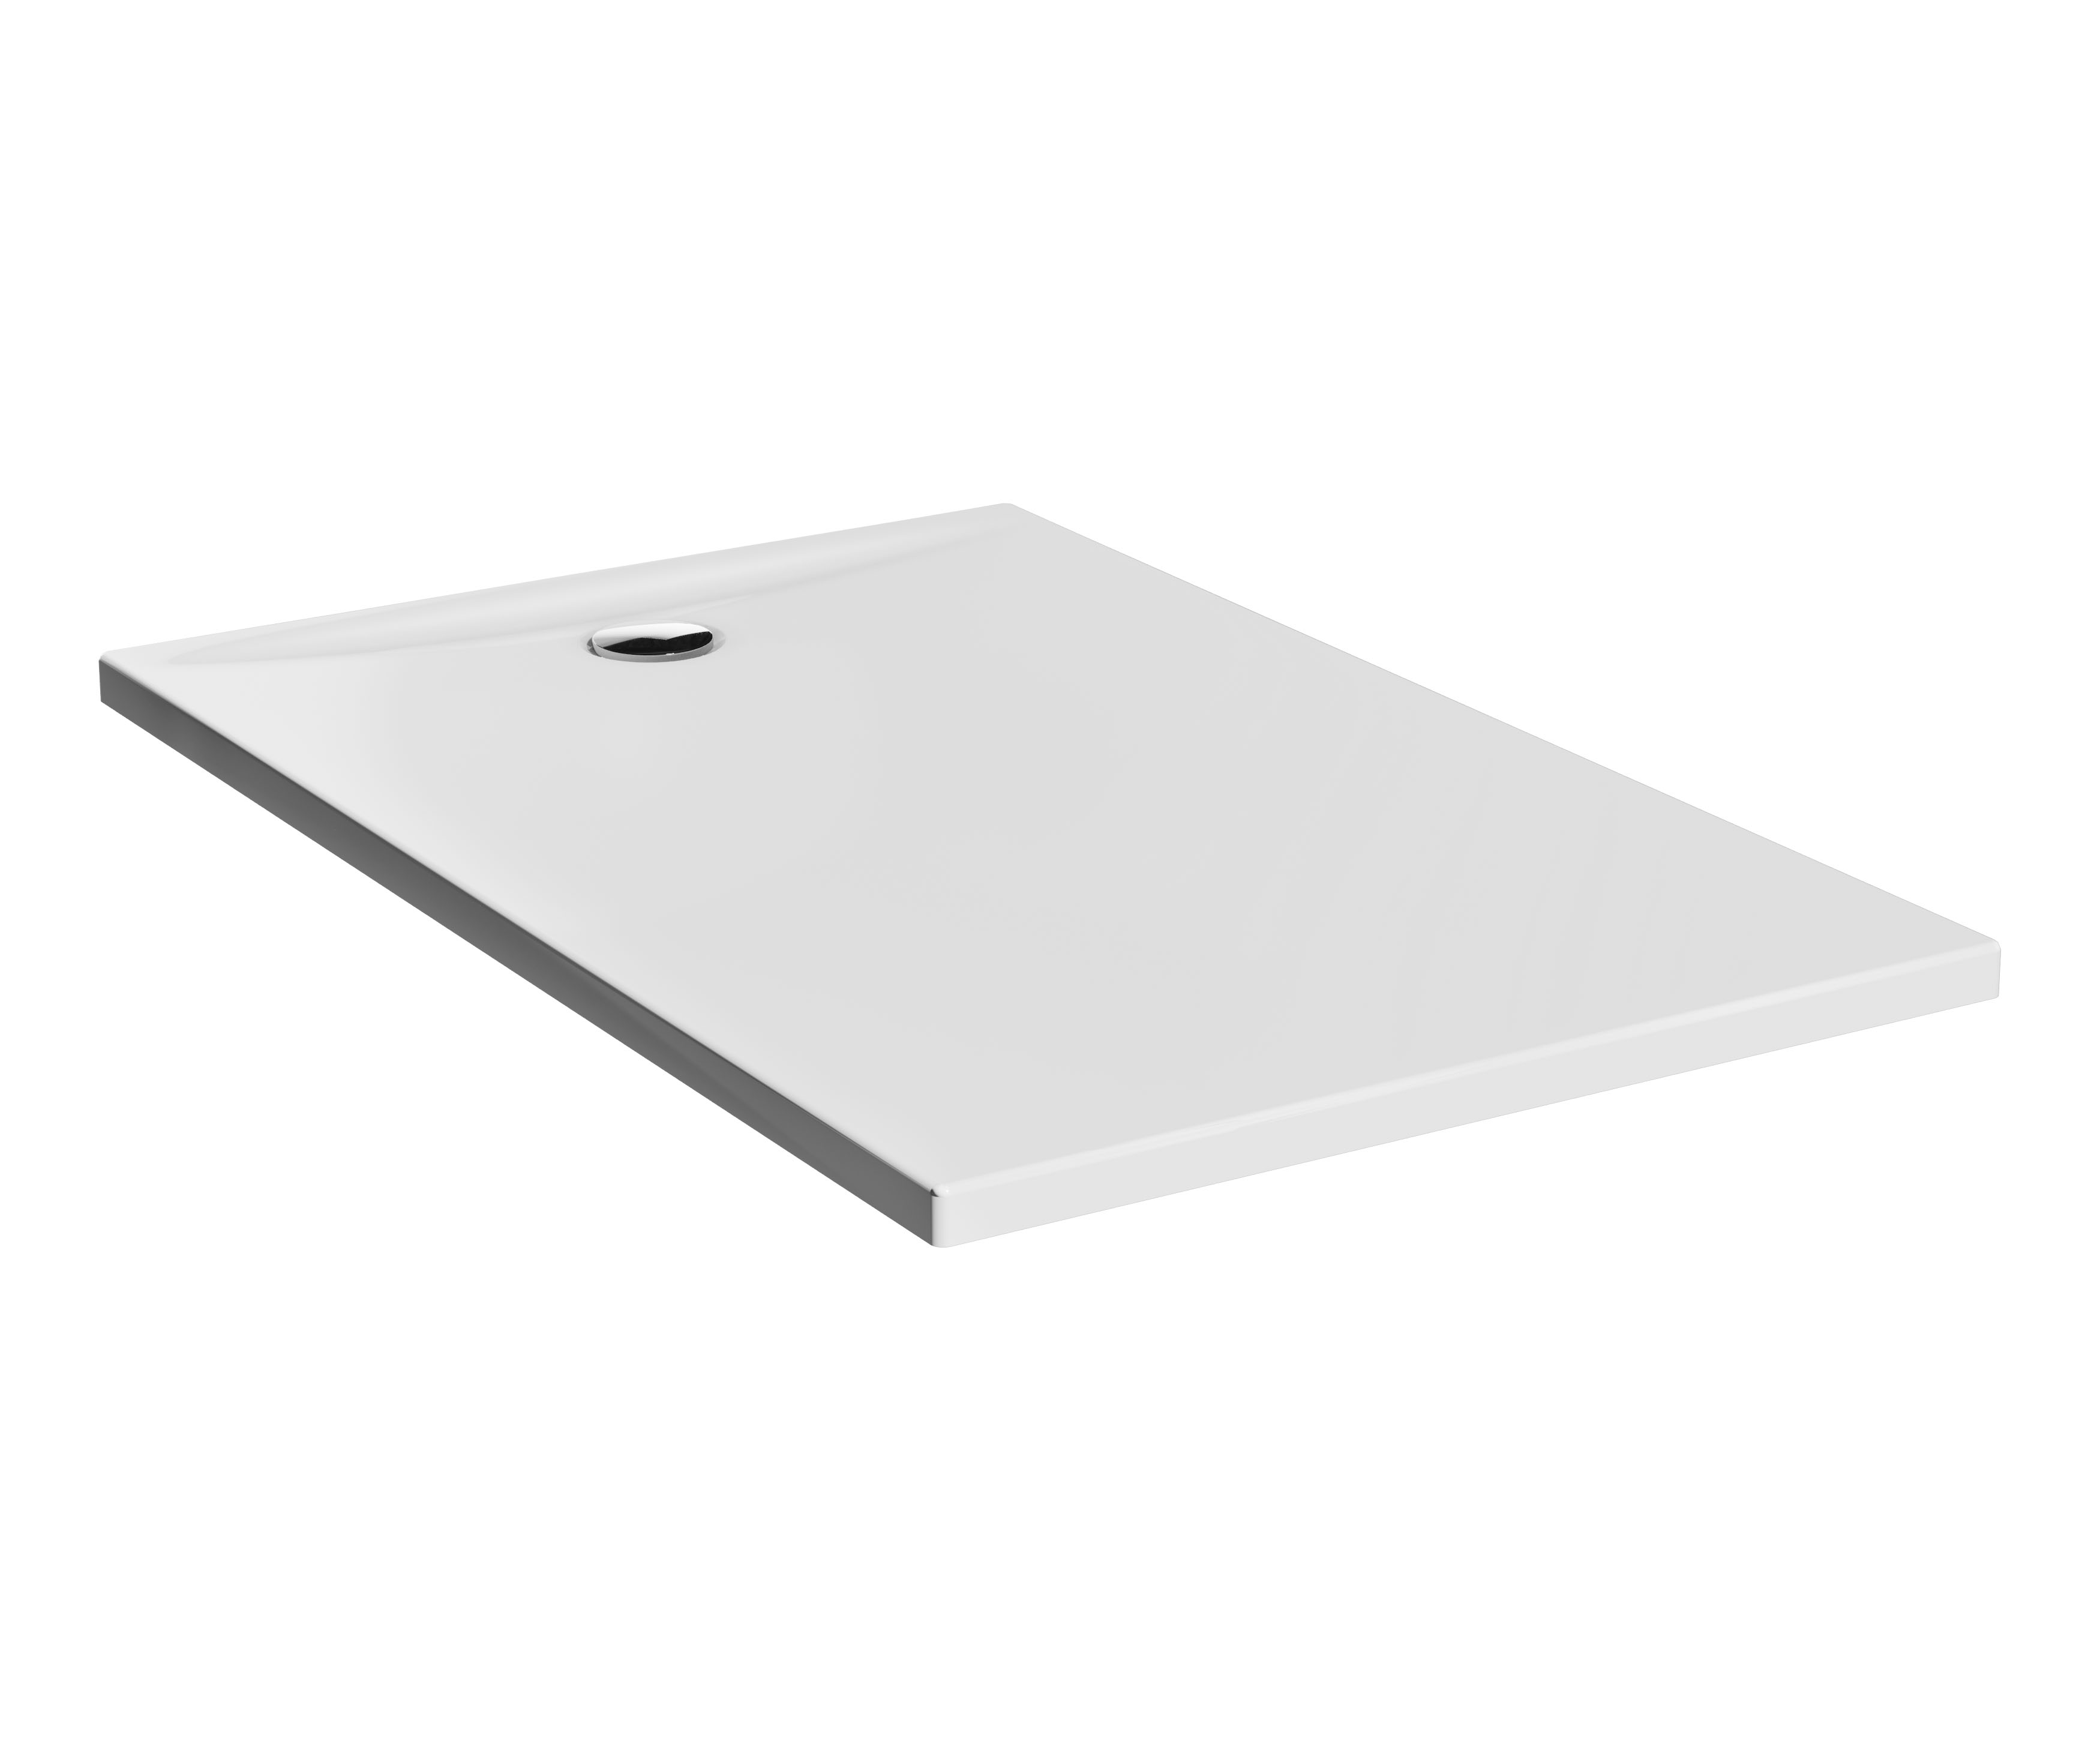 Lagoon receveur ultra plat en céramique, 140  x  90 cm, blanc